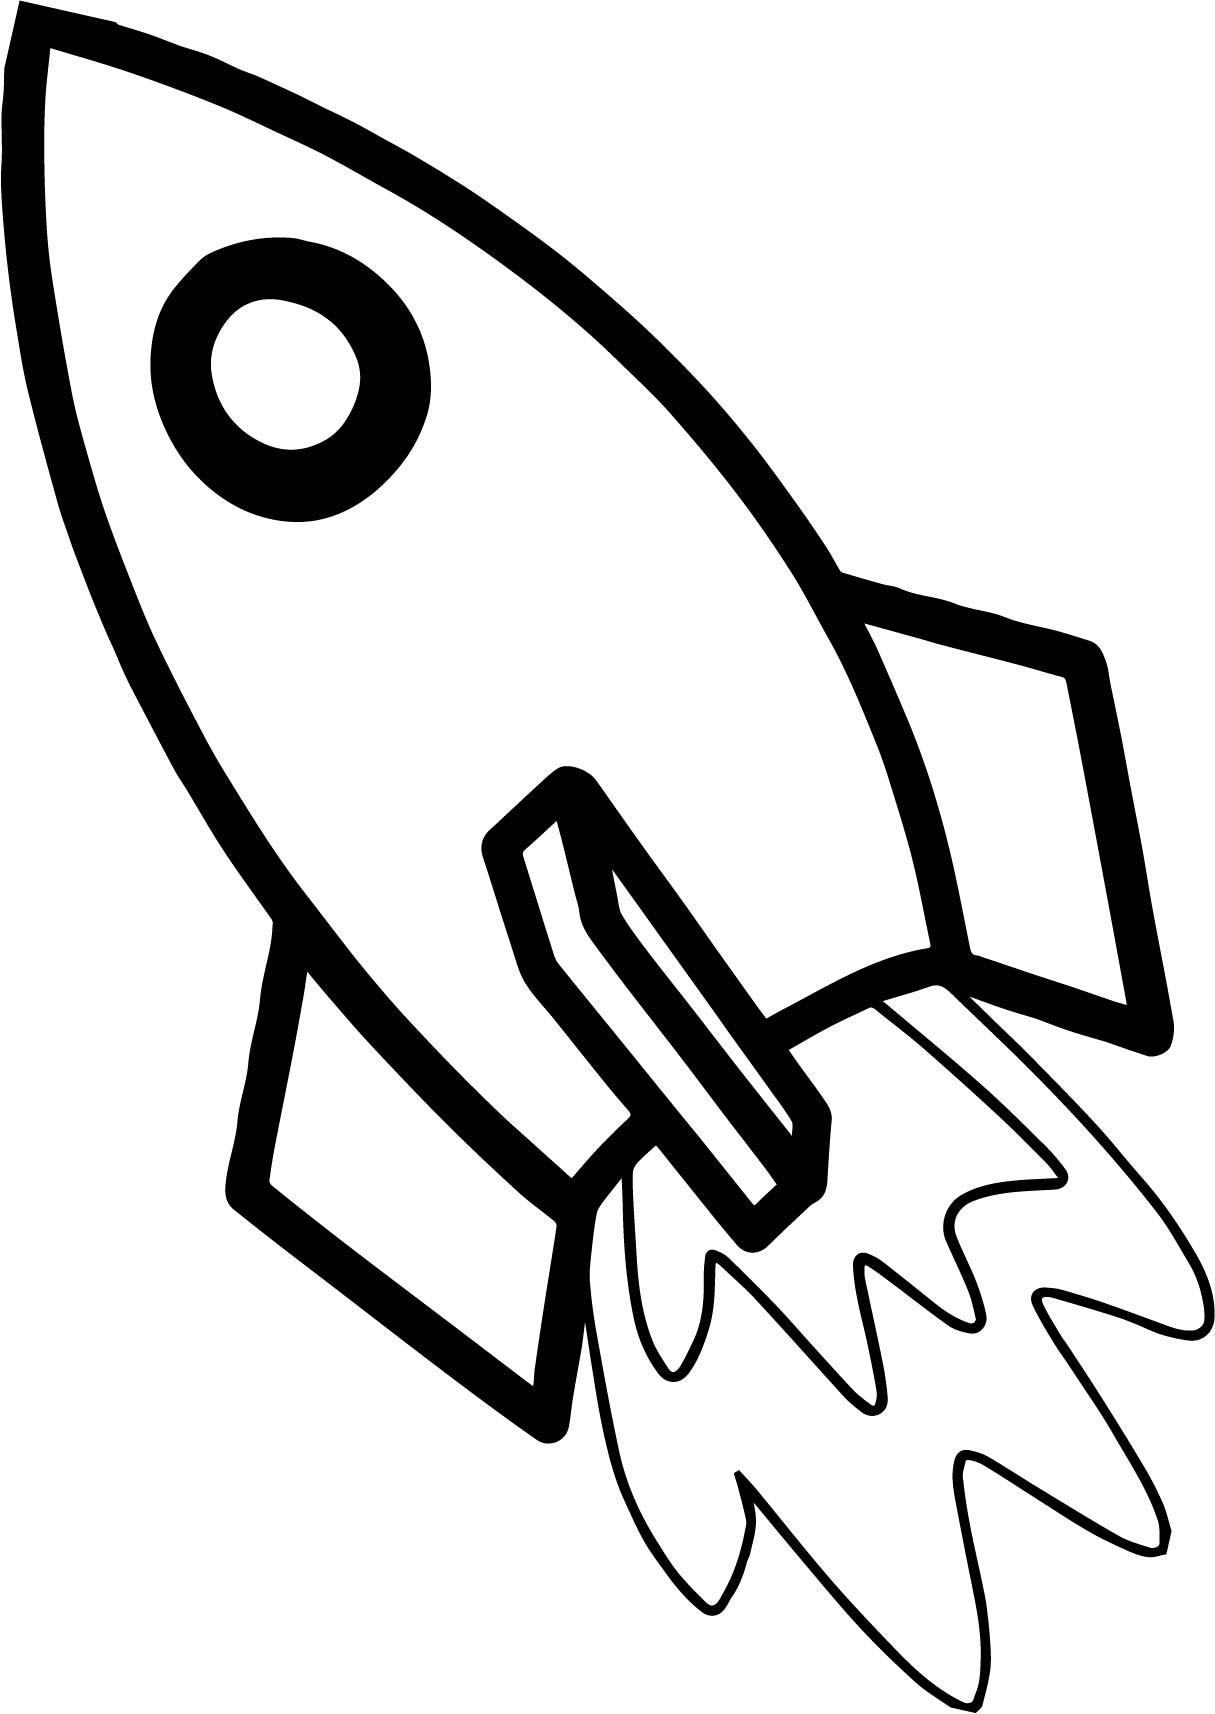 3449 Rocket free clipart.